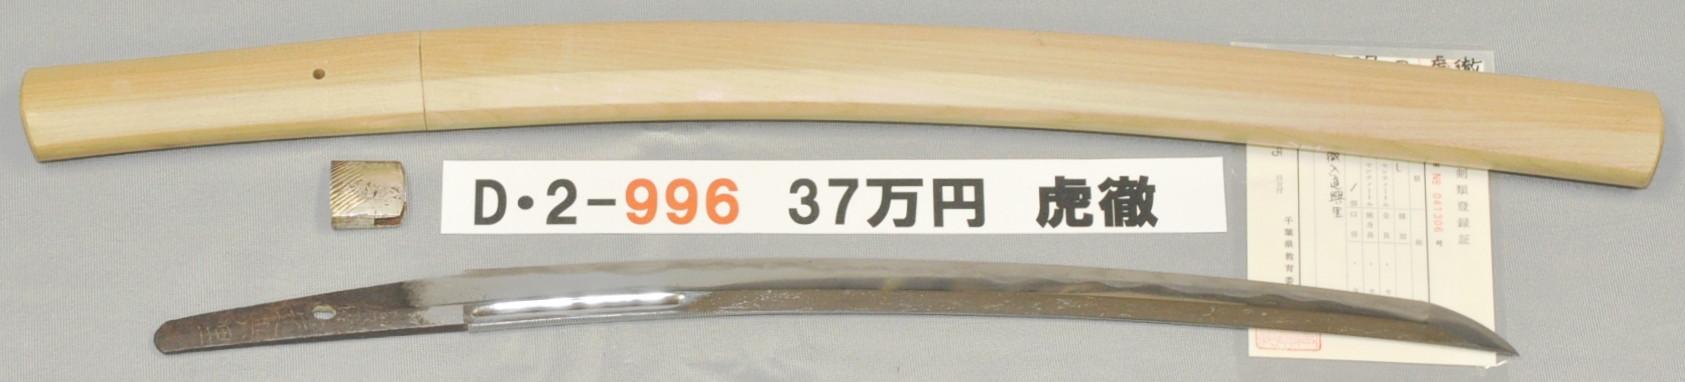 D2996